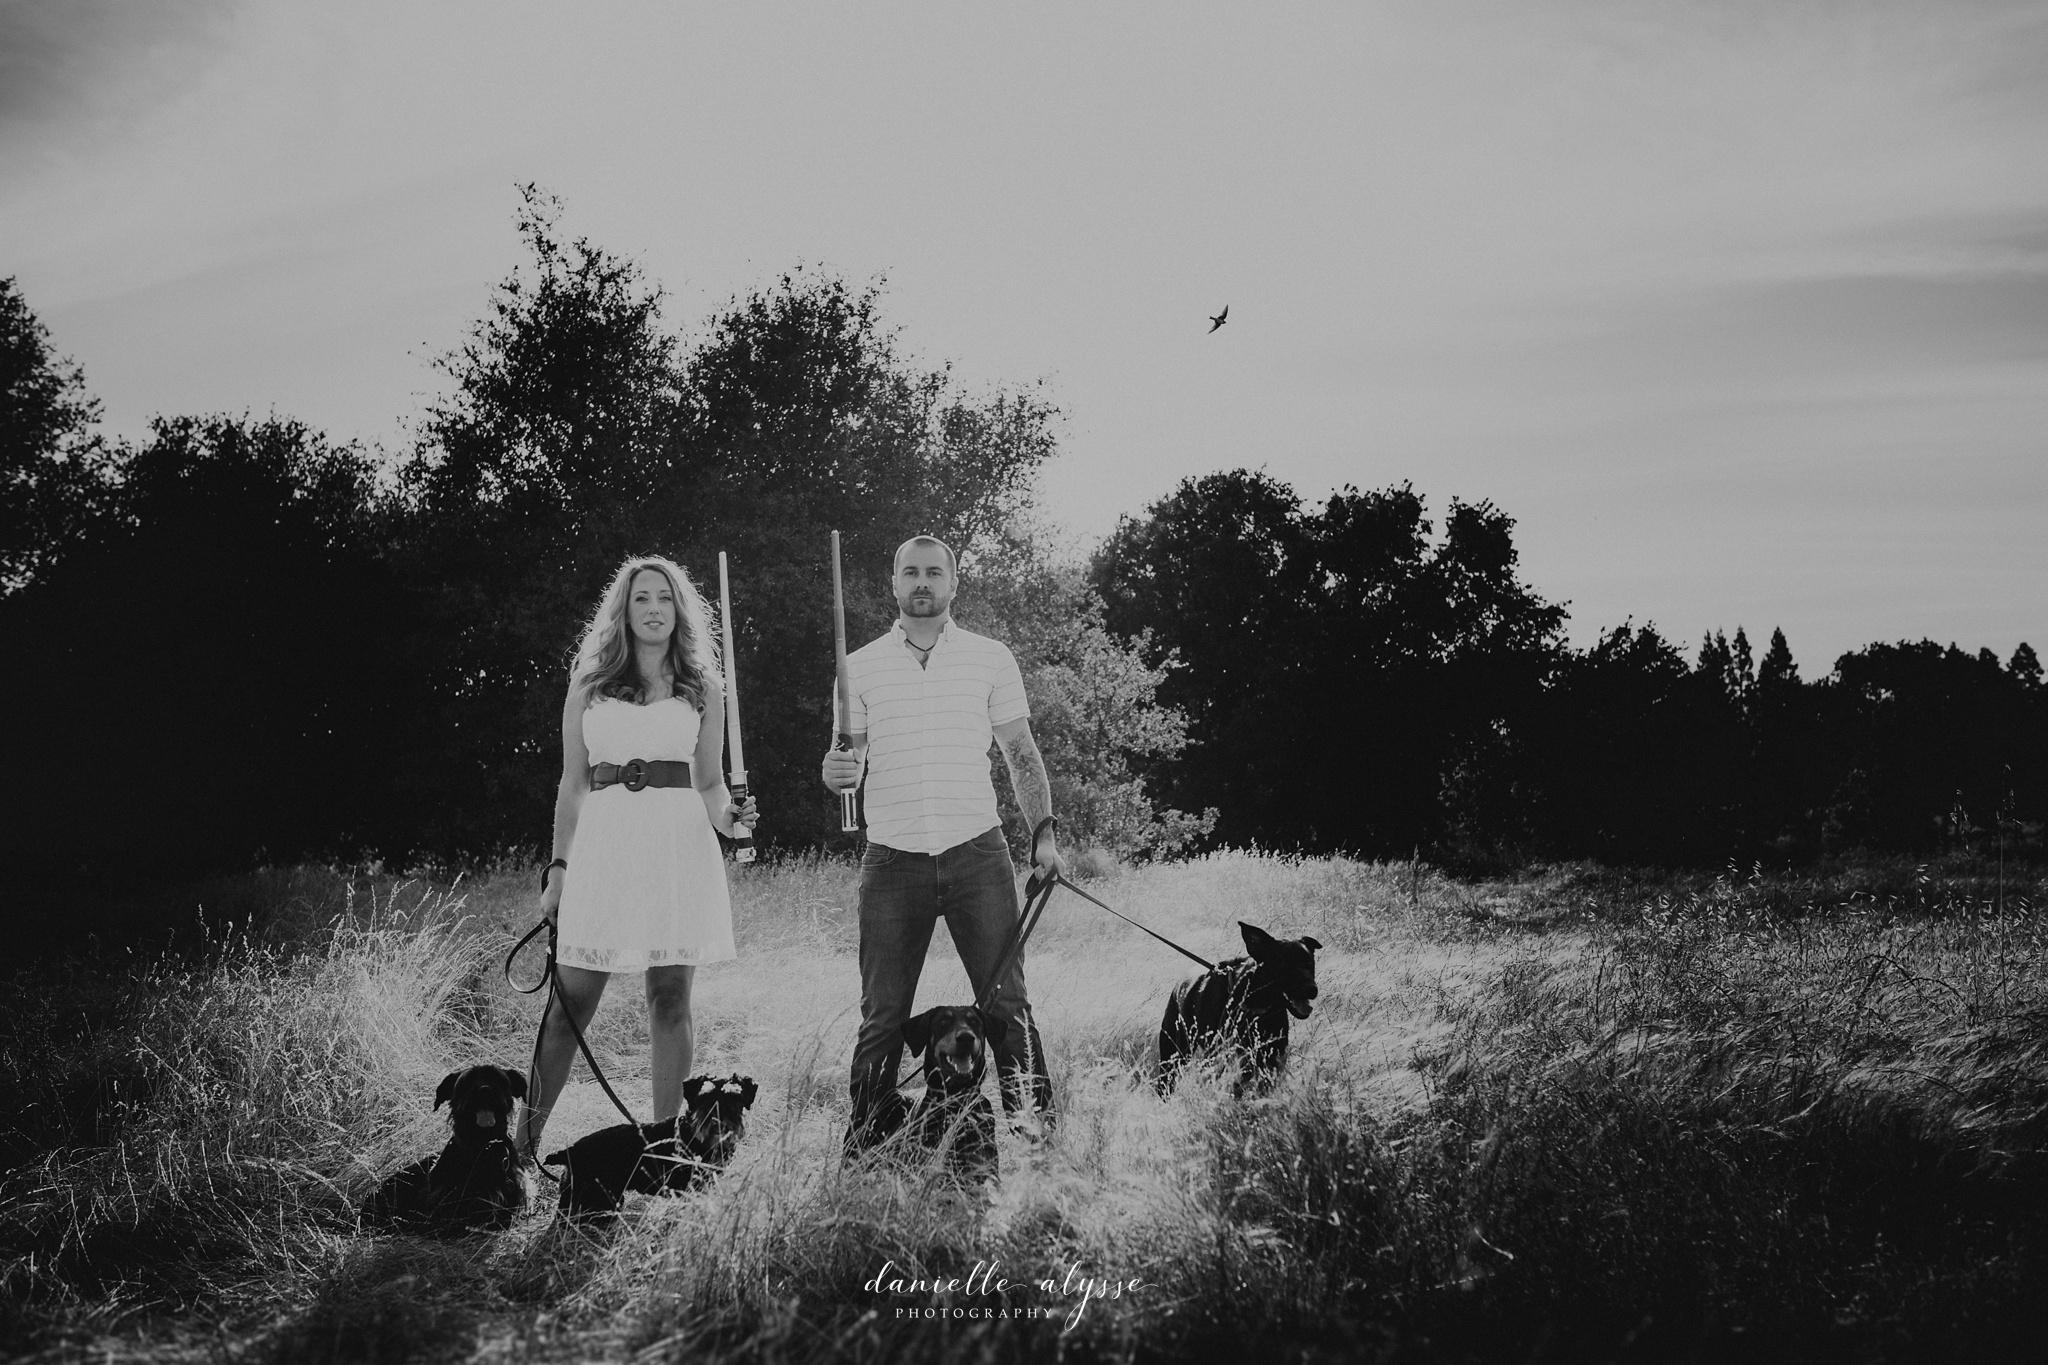 180520_engagement_sarah_jon_dogs_danielle_alysse_photography_elk_grove_photographer_blog_7_WEB.jpg